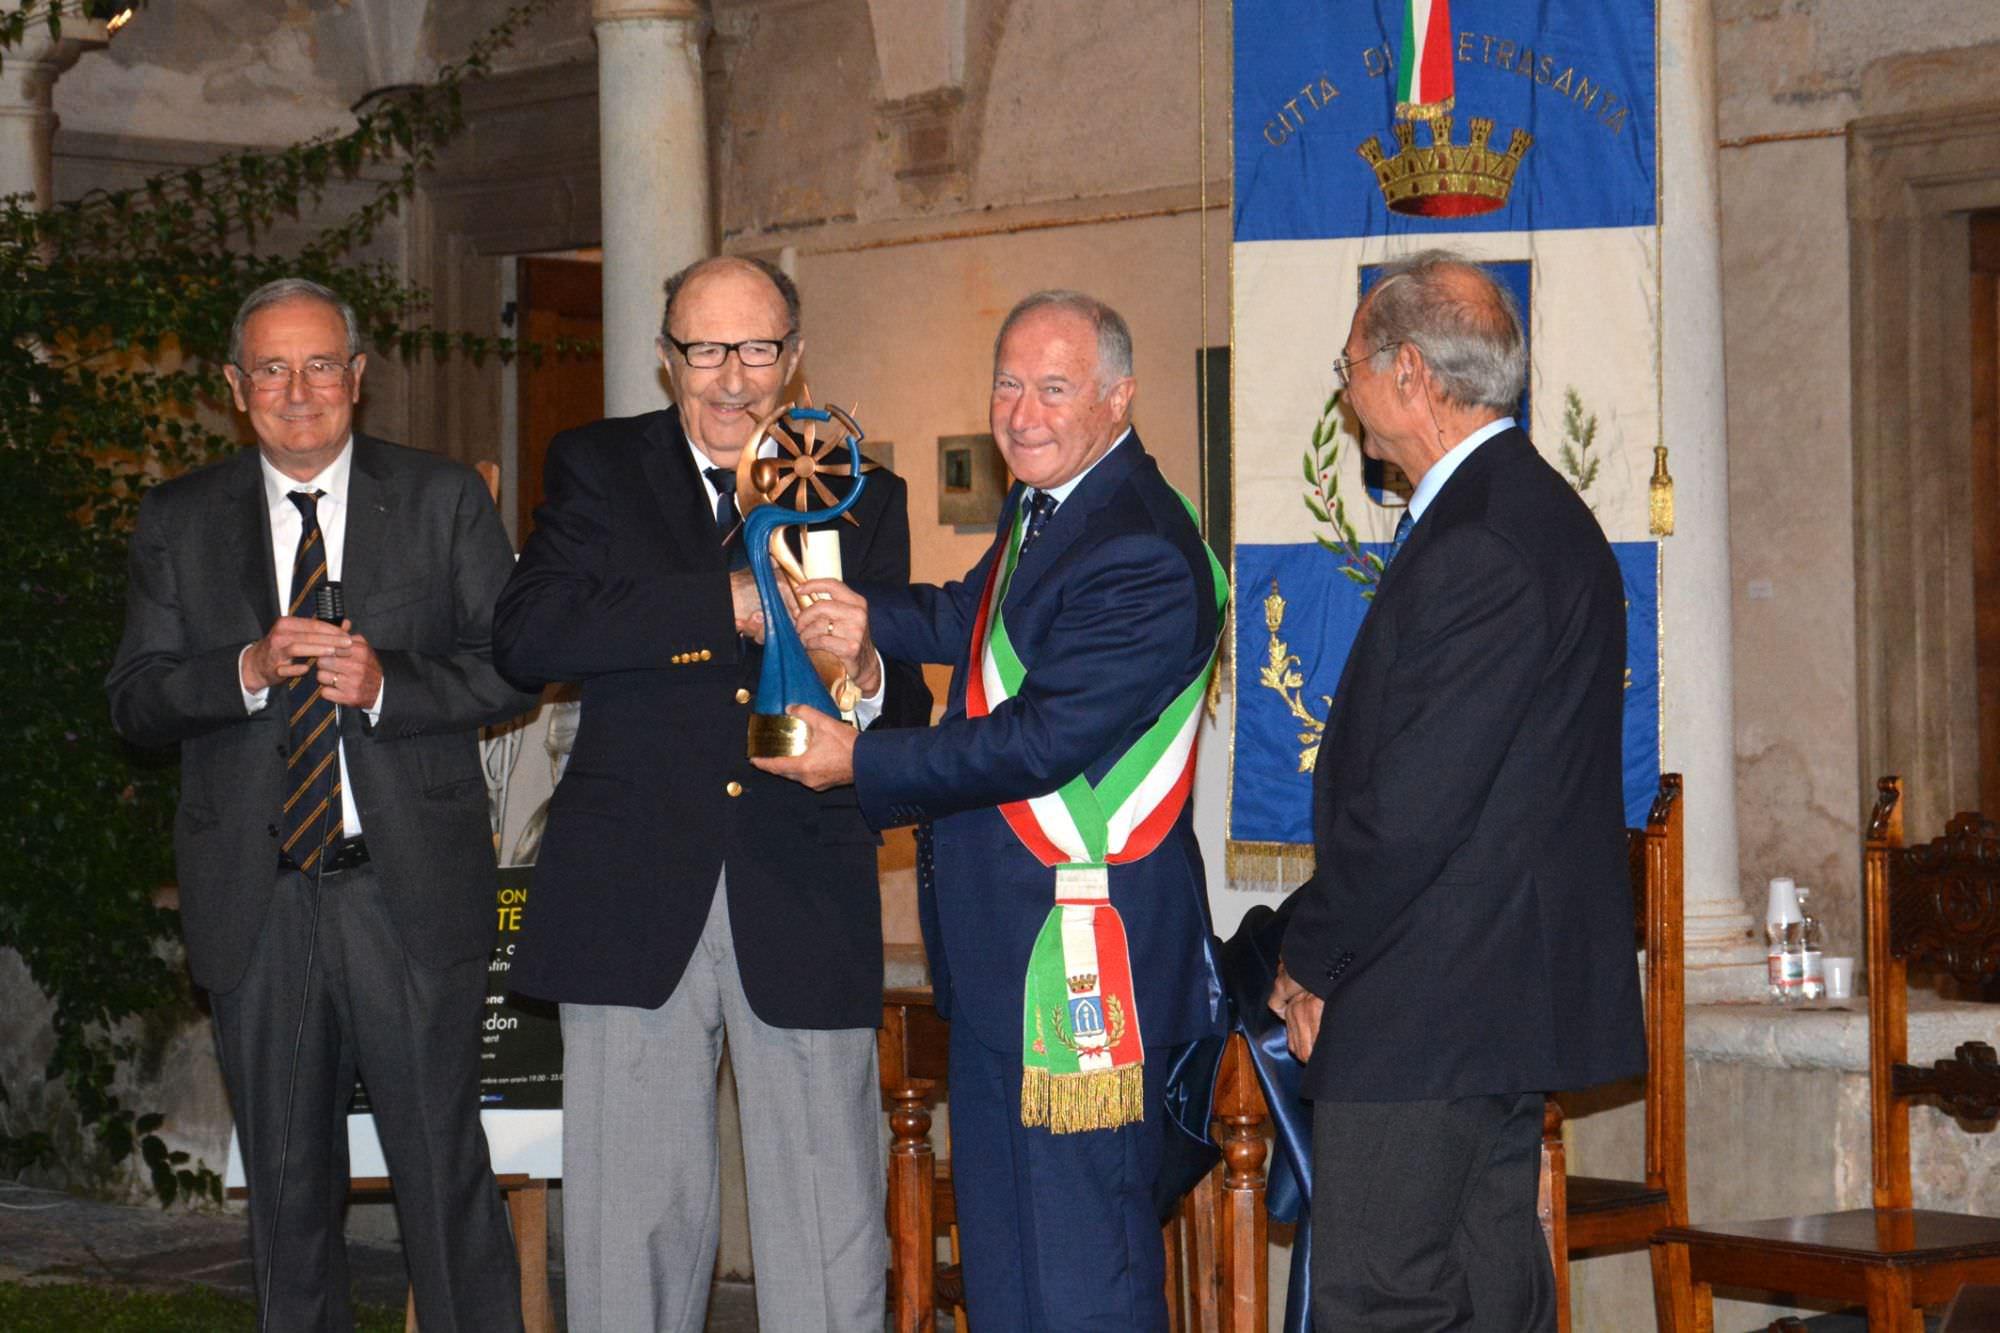 Padre Eugenio Barsanti testimonial di Pianeta Galileo